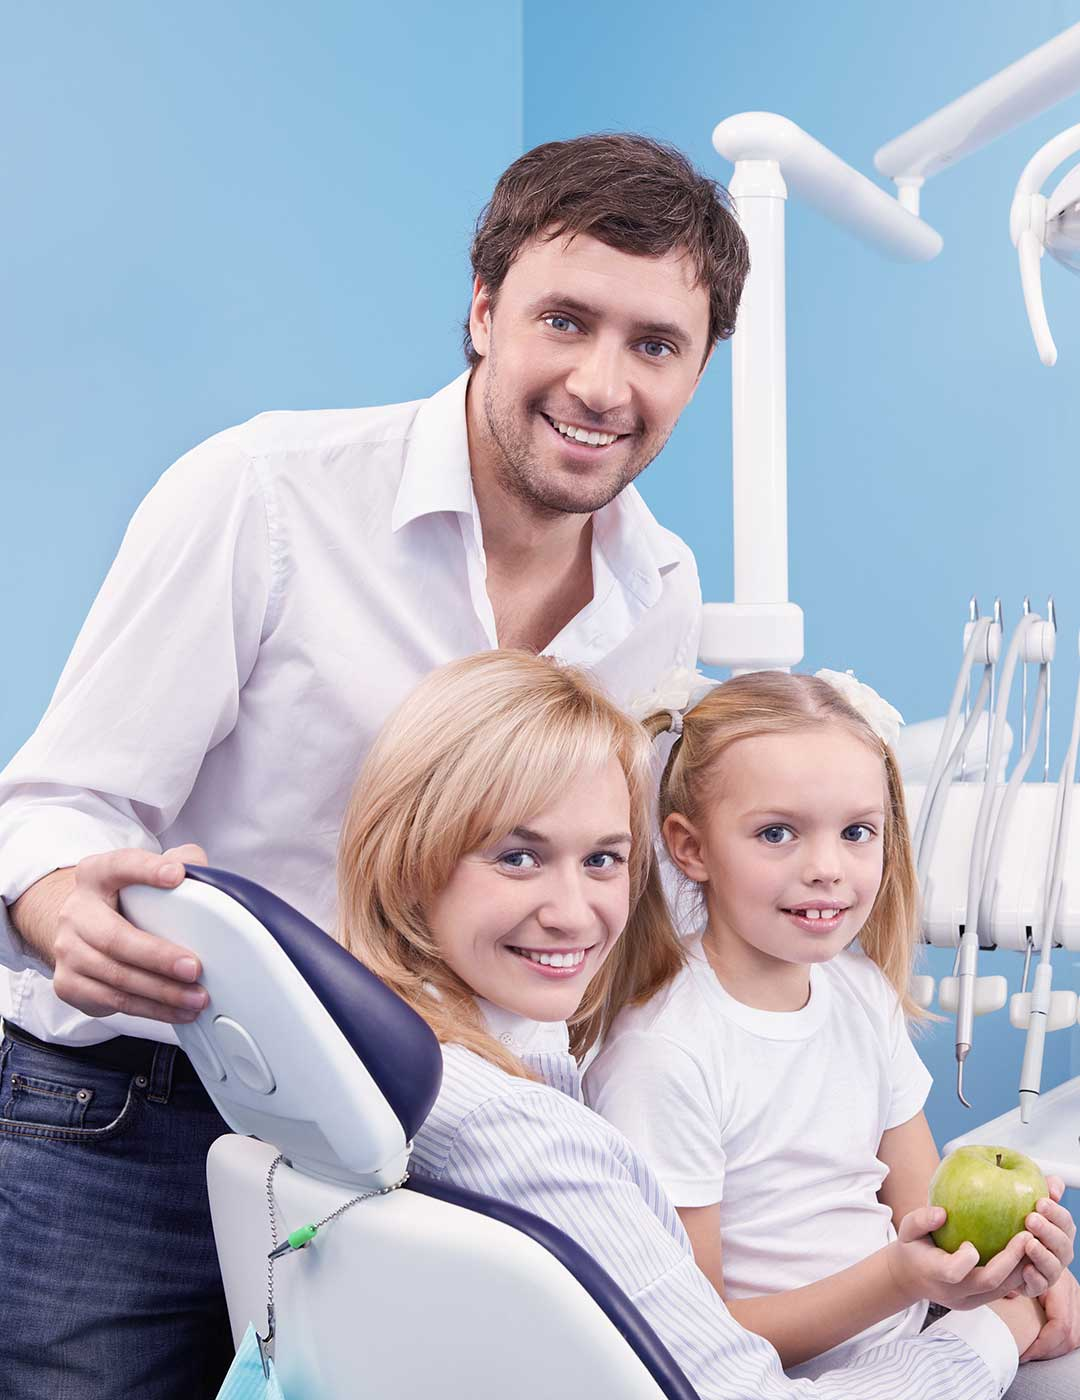 Your First Dental Visit